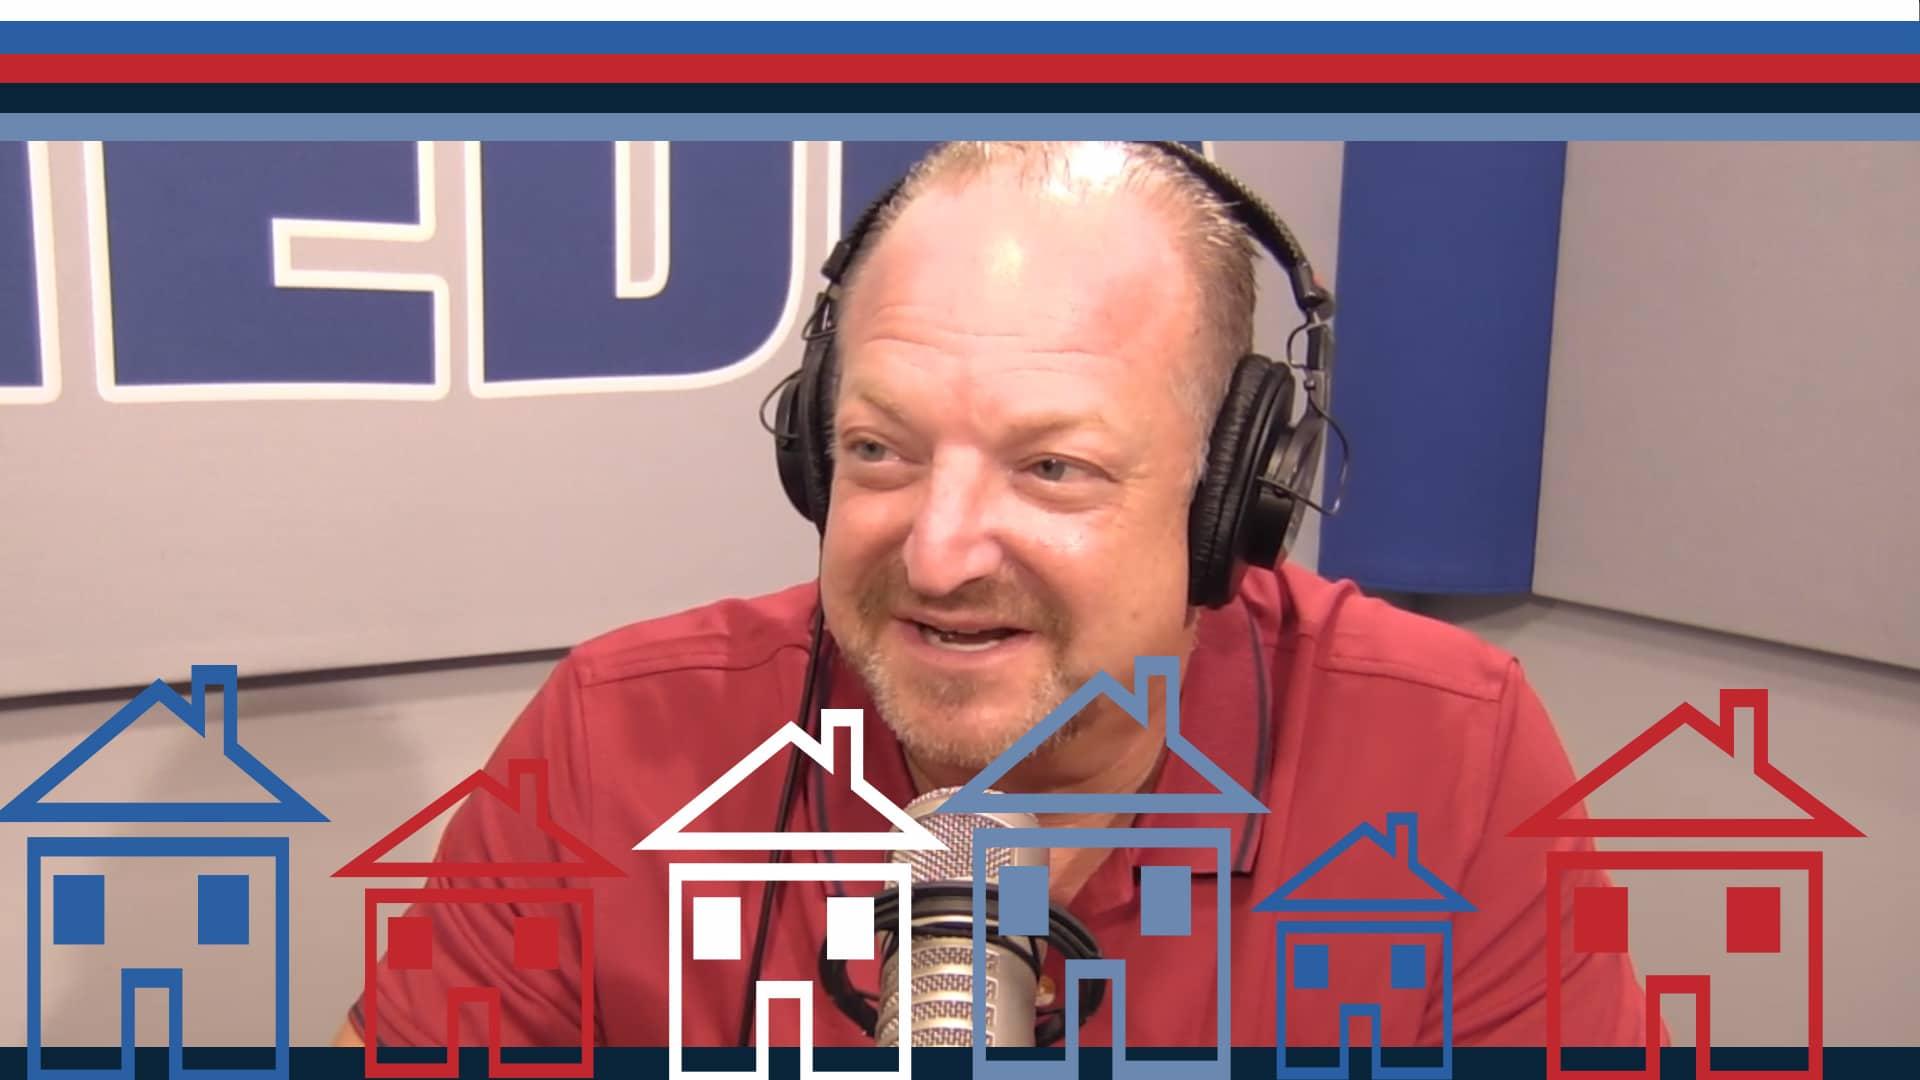 Real Estate Realities - Episode 18